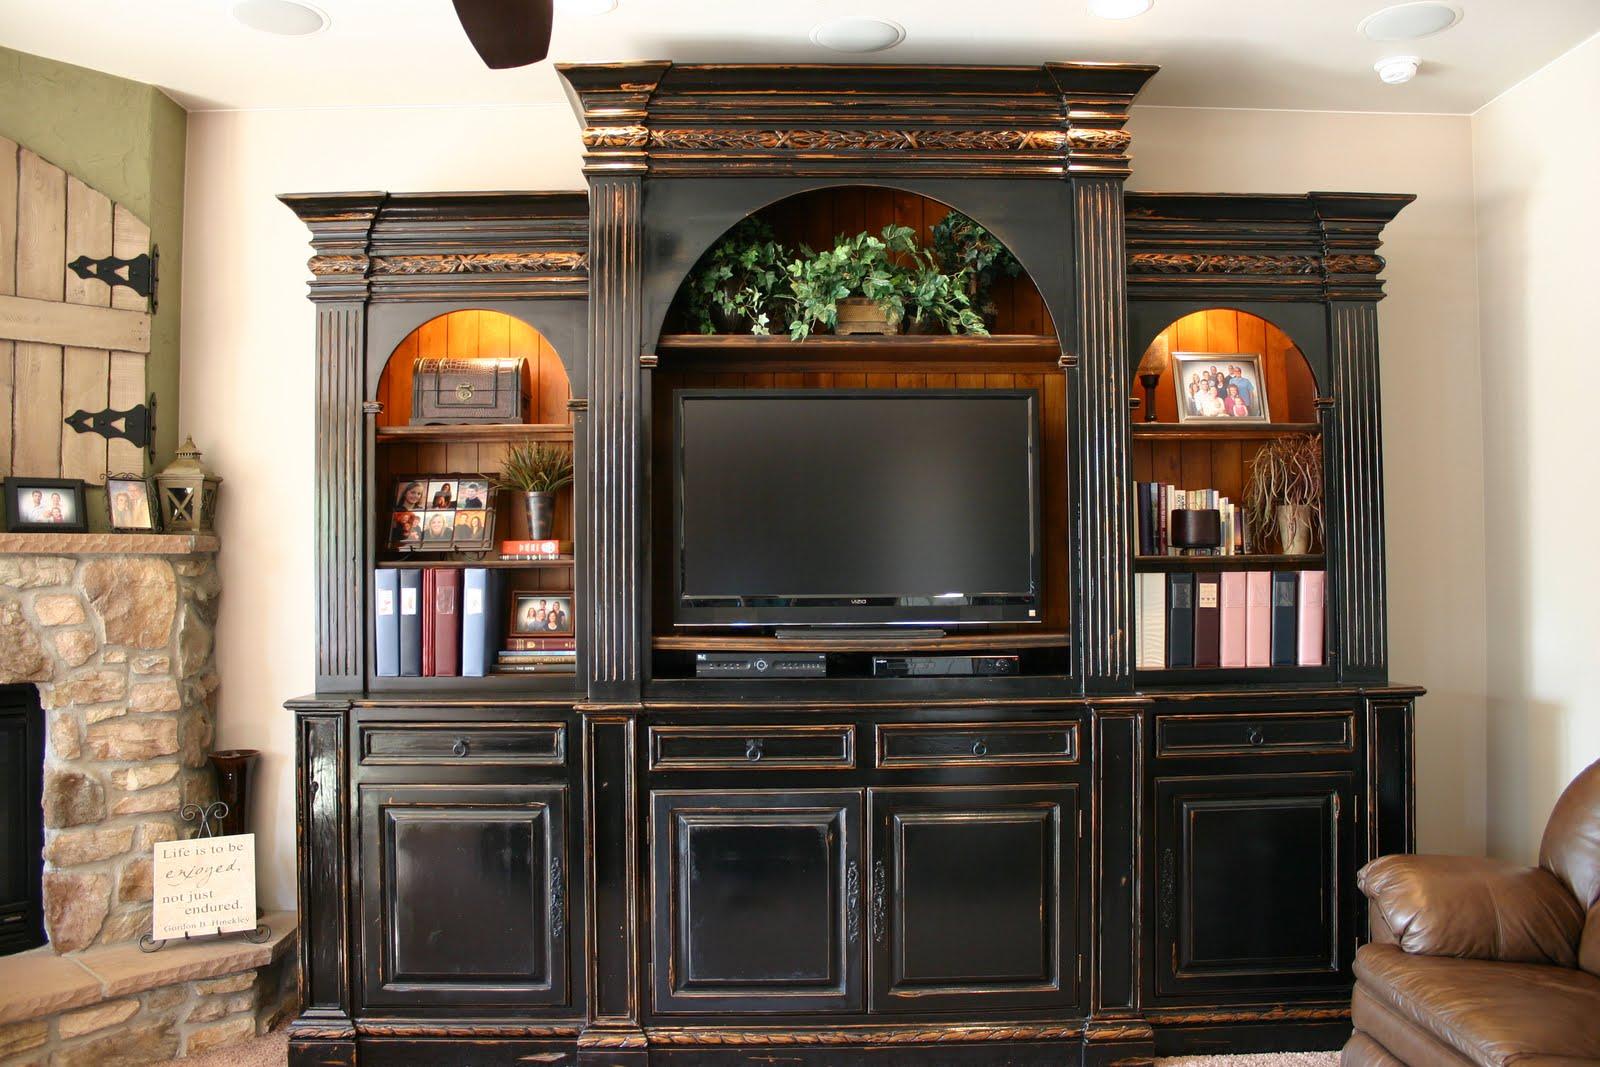 doubletake decor entertainment center. Black Bedroom Furniture Sets. Home Design Ideas